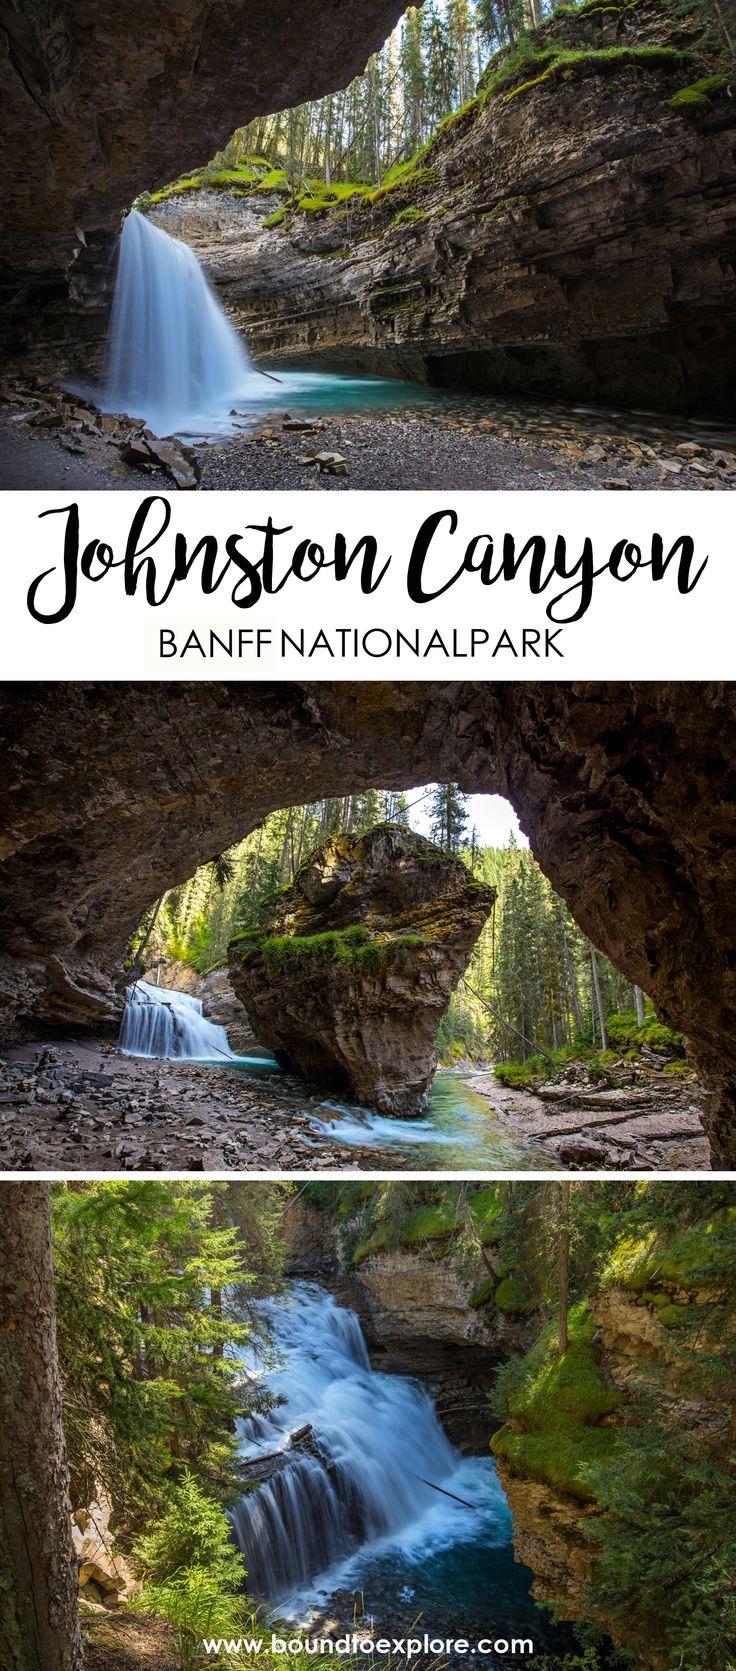 Exploring Johnston Canyon in Banff National Park